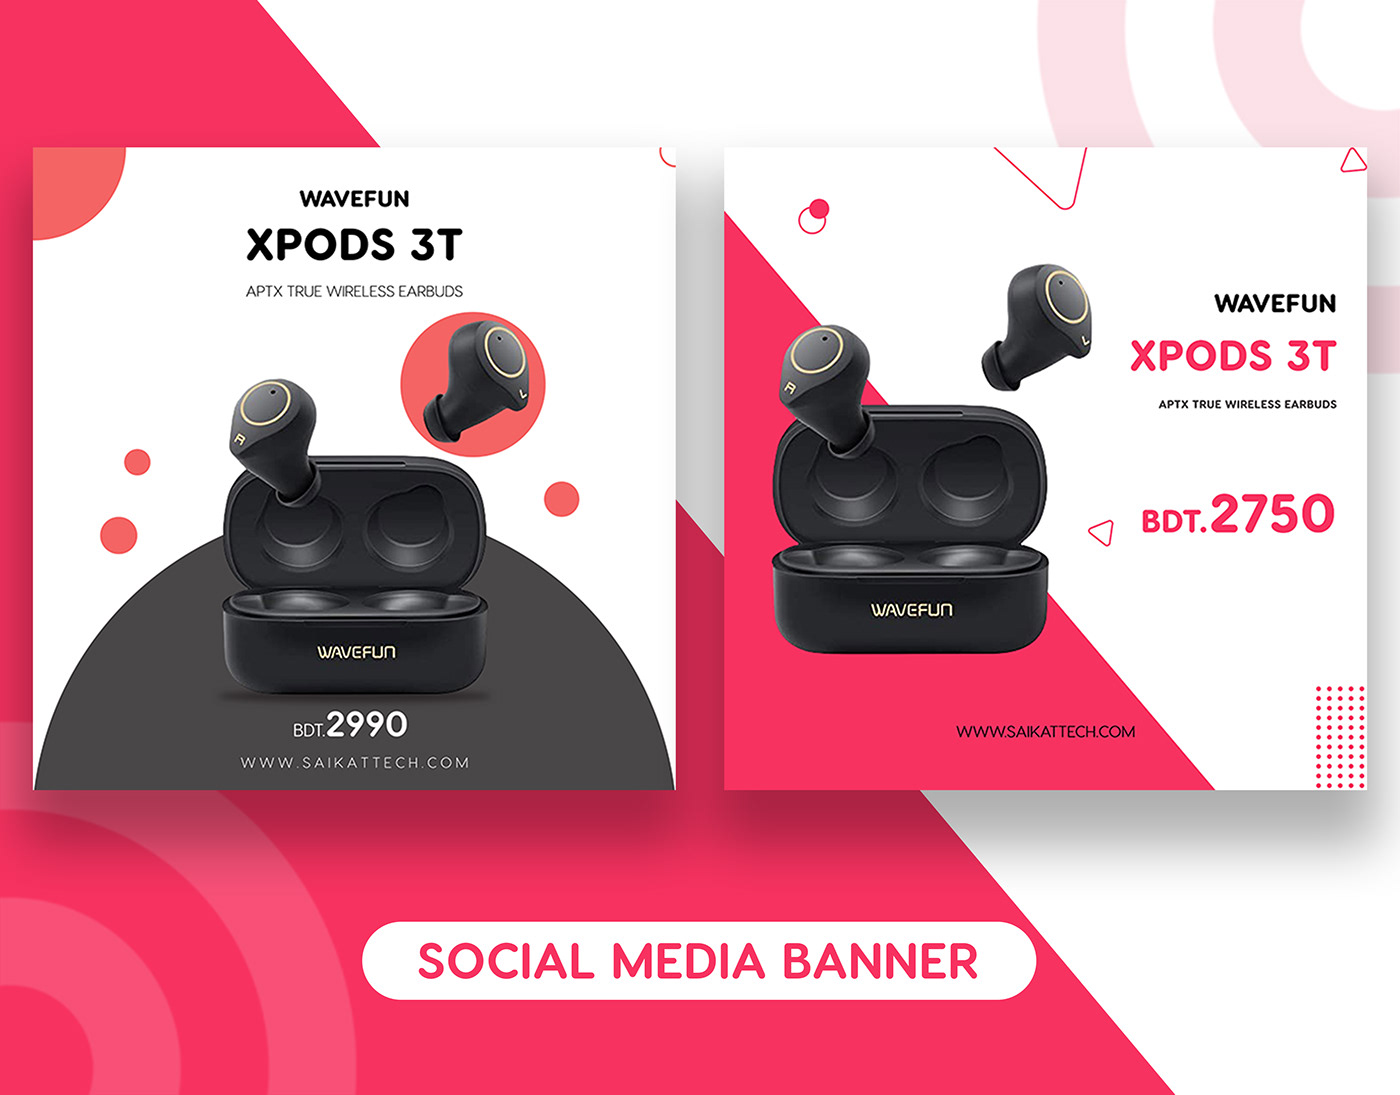 social media banner sizes,social media banner sizes 2020,social media banner examples,social media b